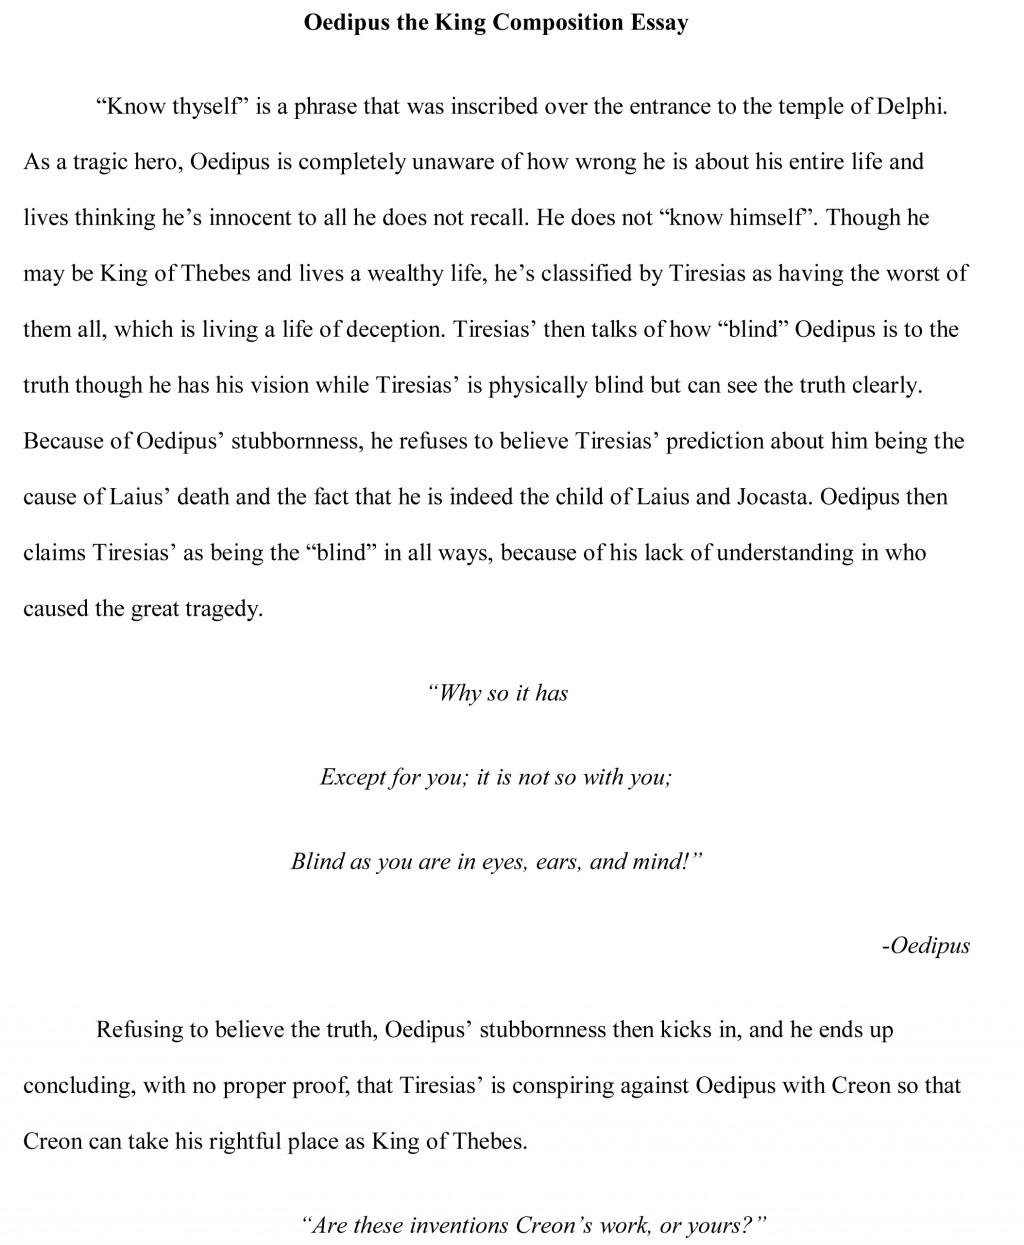 023 Good Essay Hooks Oedipus Free Sample Rare Generator Best Ever College Large